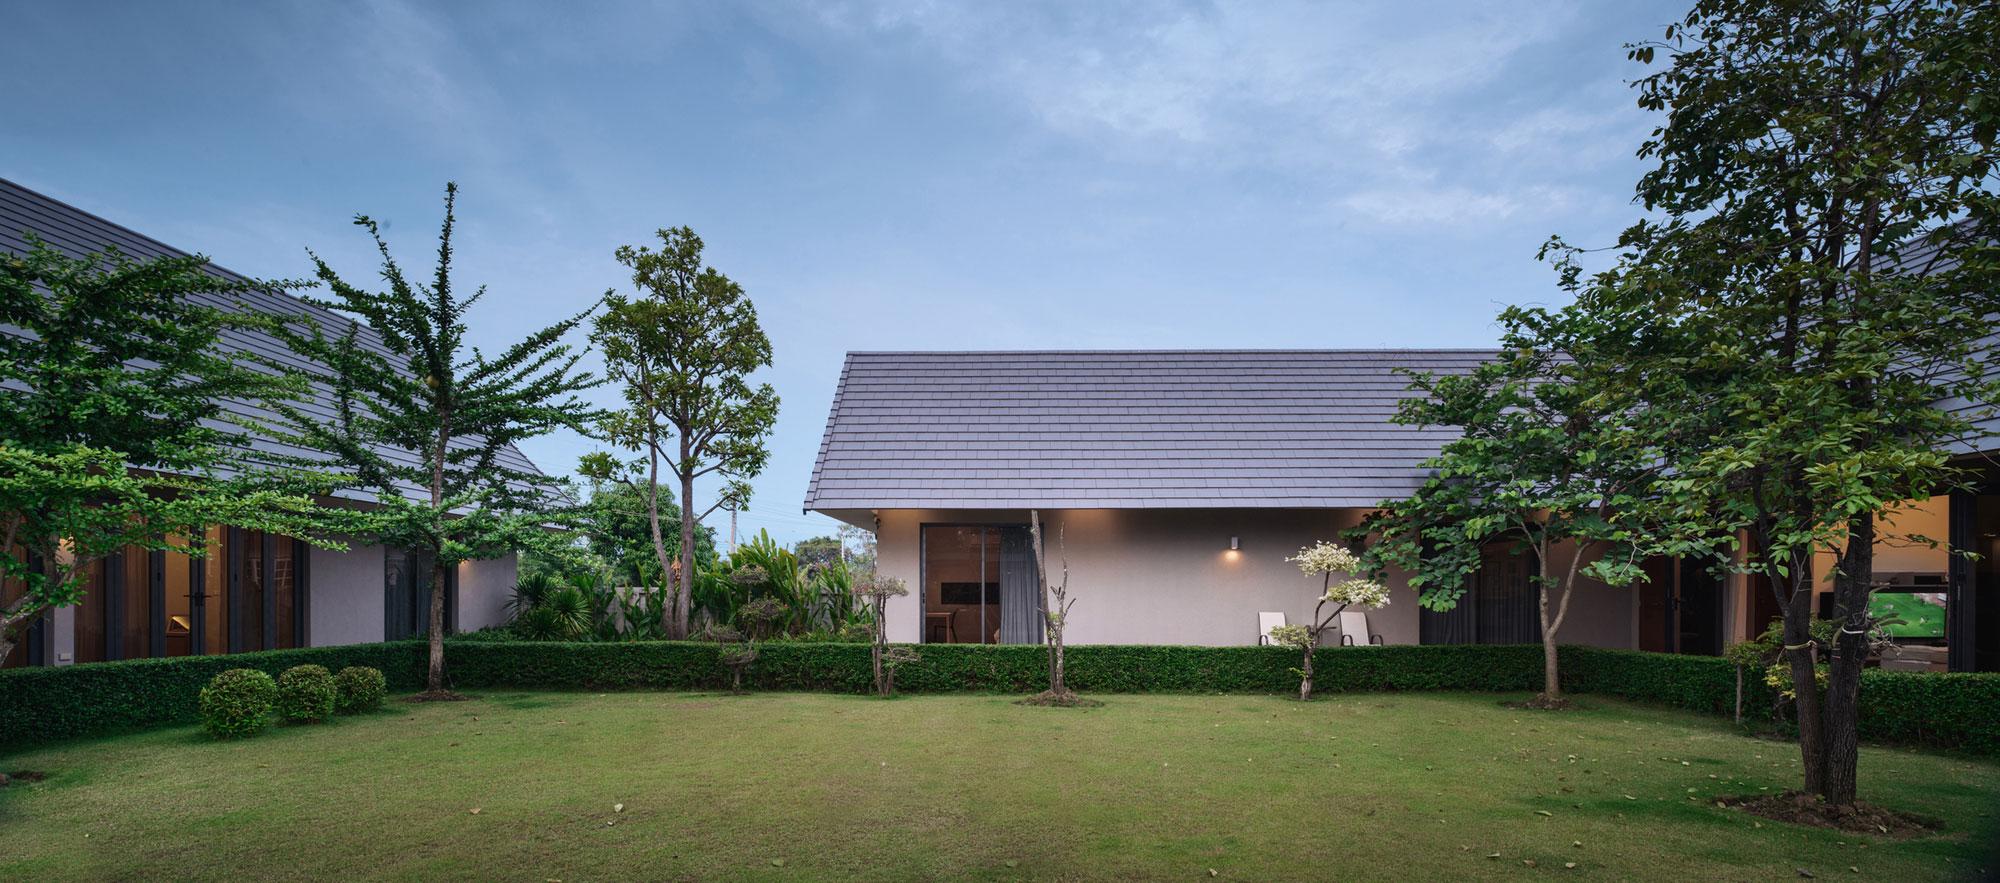 The Triangle House near Bangkok by Phongphat Ueasangkhomset-20